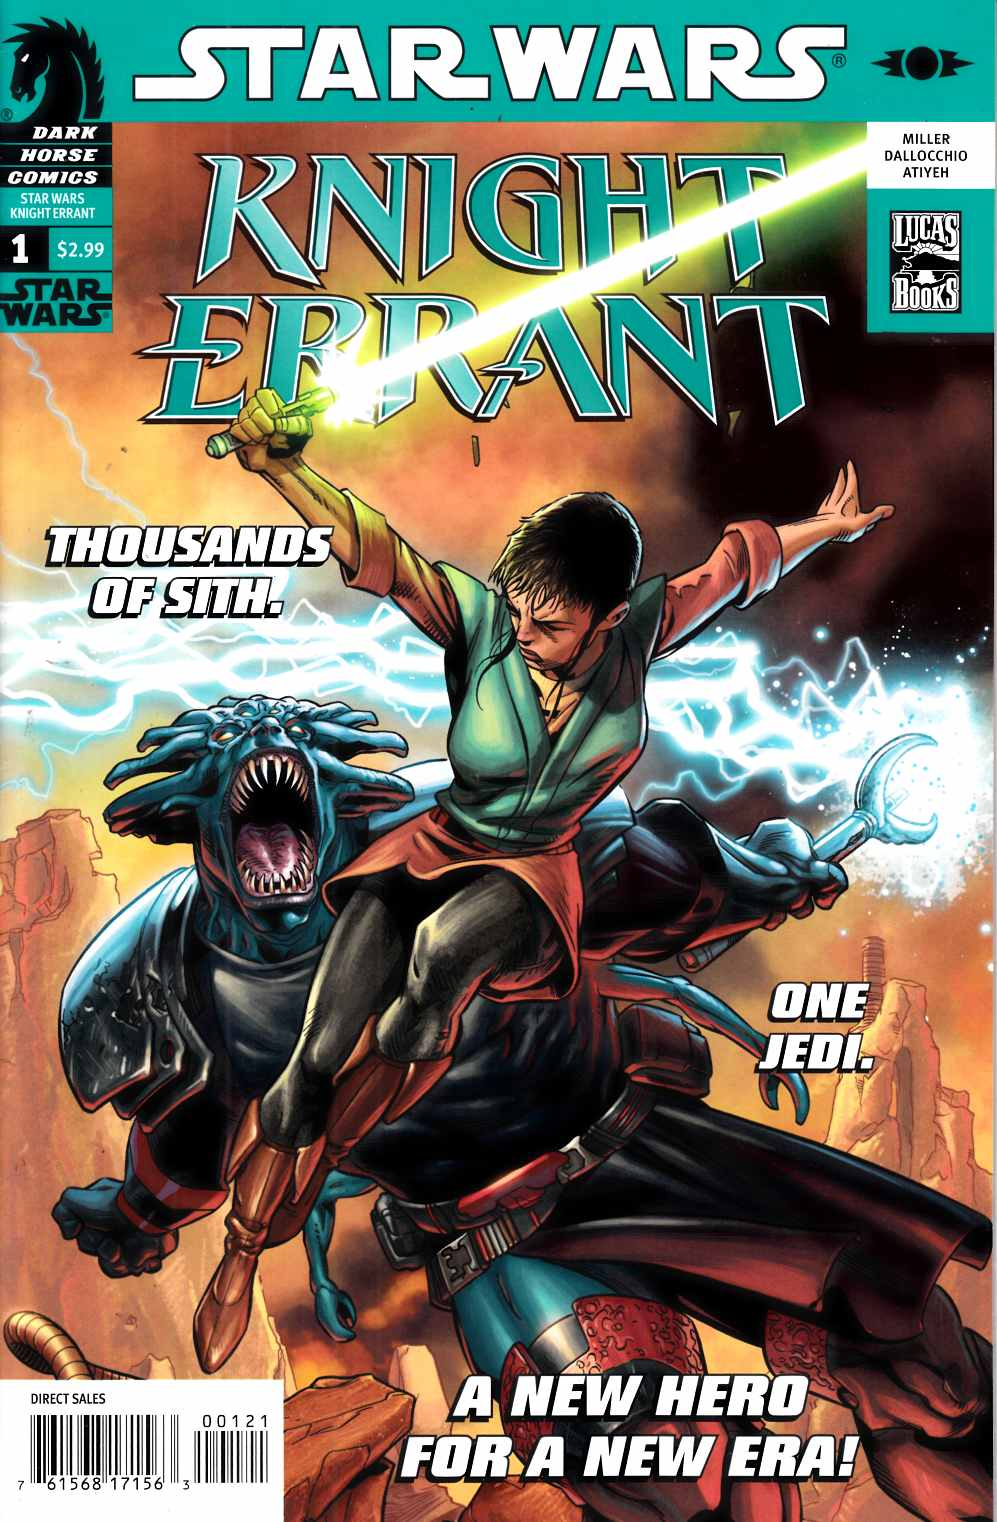 Star Wars: Knight Errant 1 (Variant Cover)